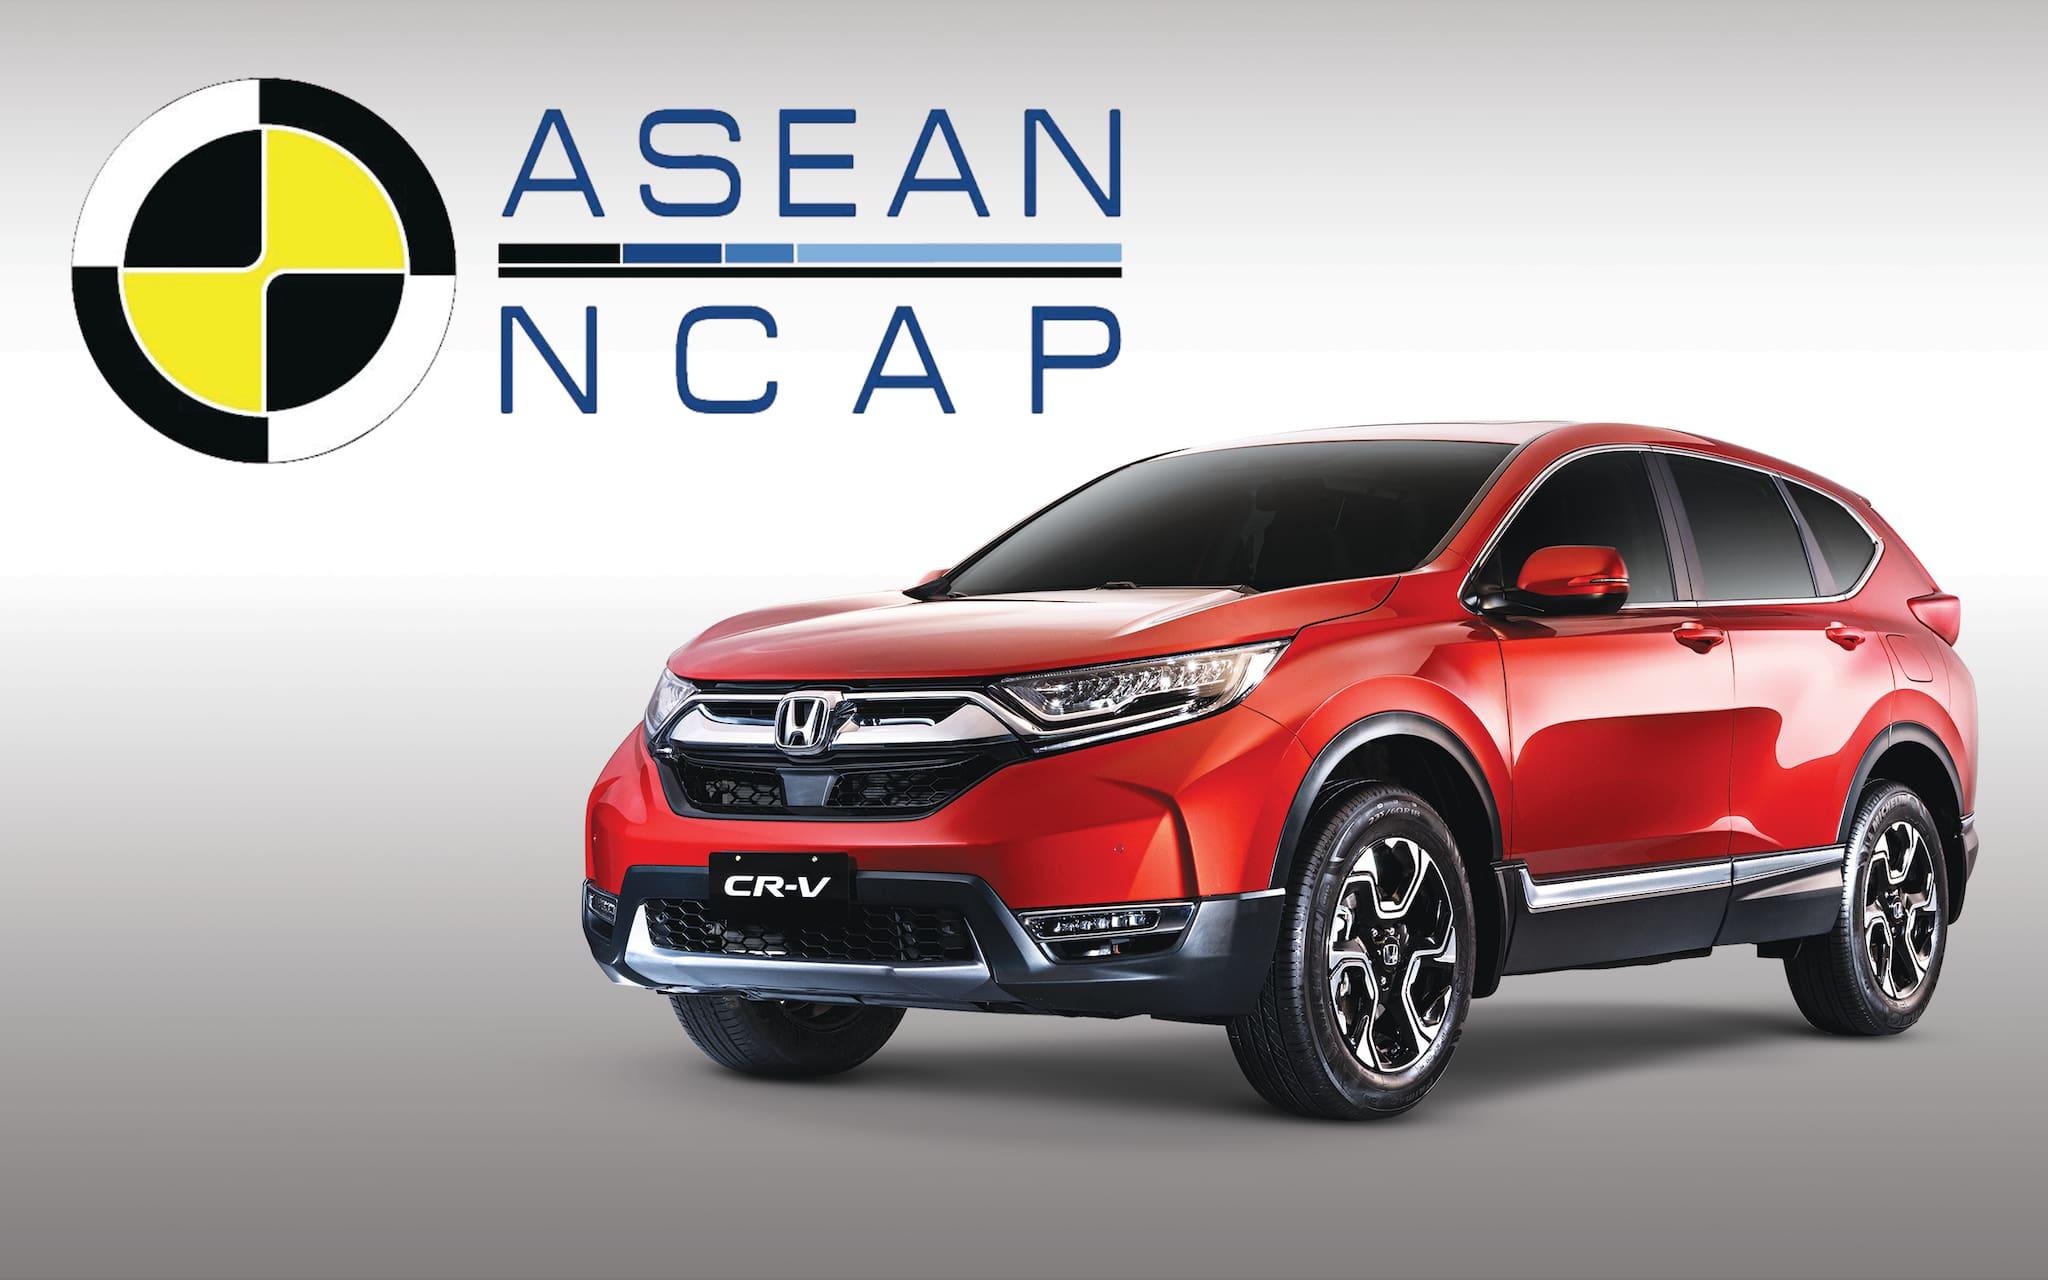 Honda CR-V Wins Two Major Awards at ASEAN NCAP Grand Prix Awards 2018